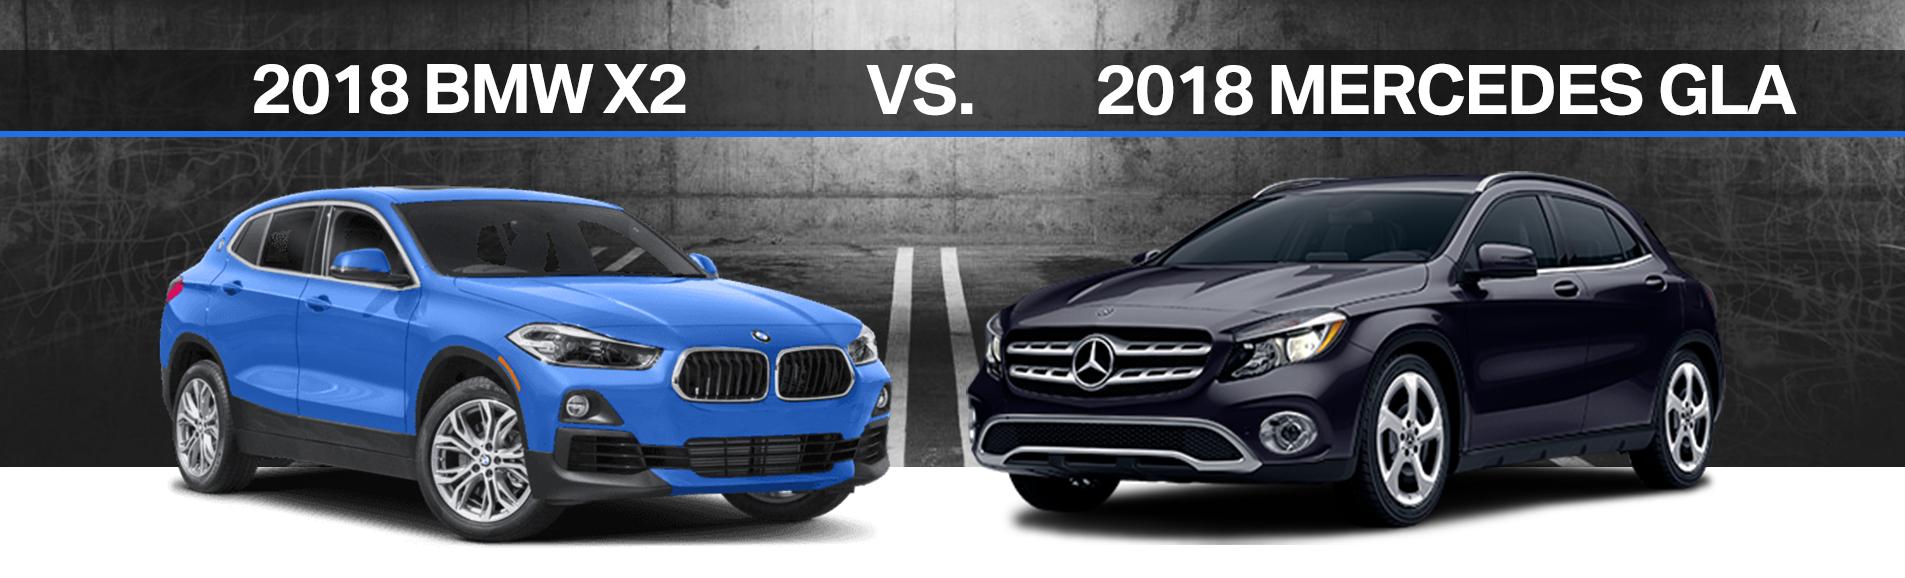 2018 Bmw X2 Vs Mercedes Gla Elmhurst Benz Fuel Filter On M2 A Comparison